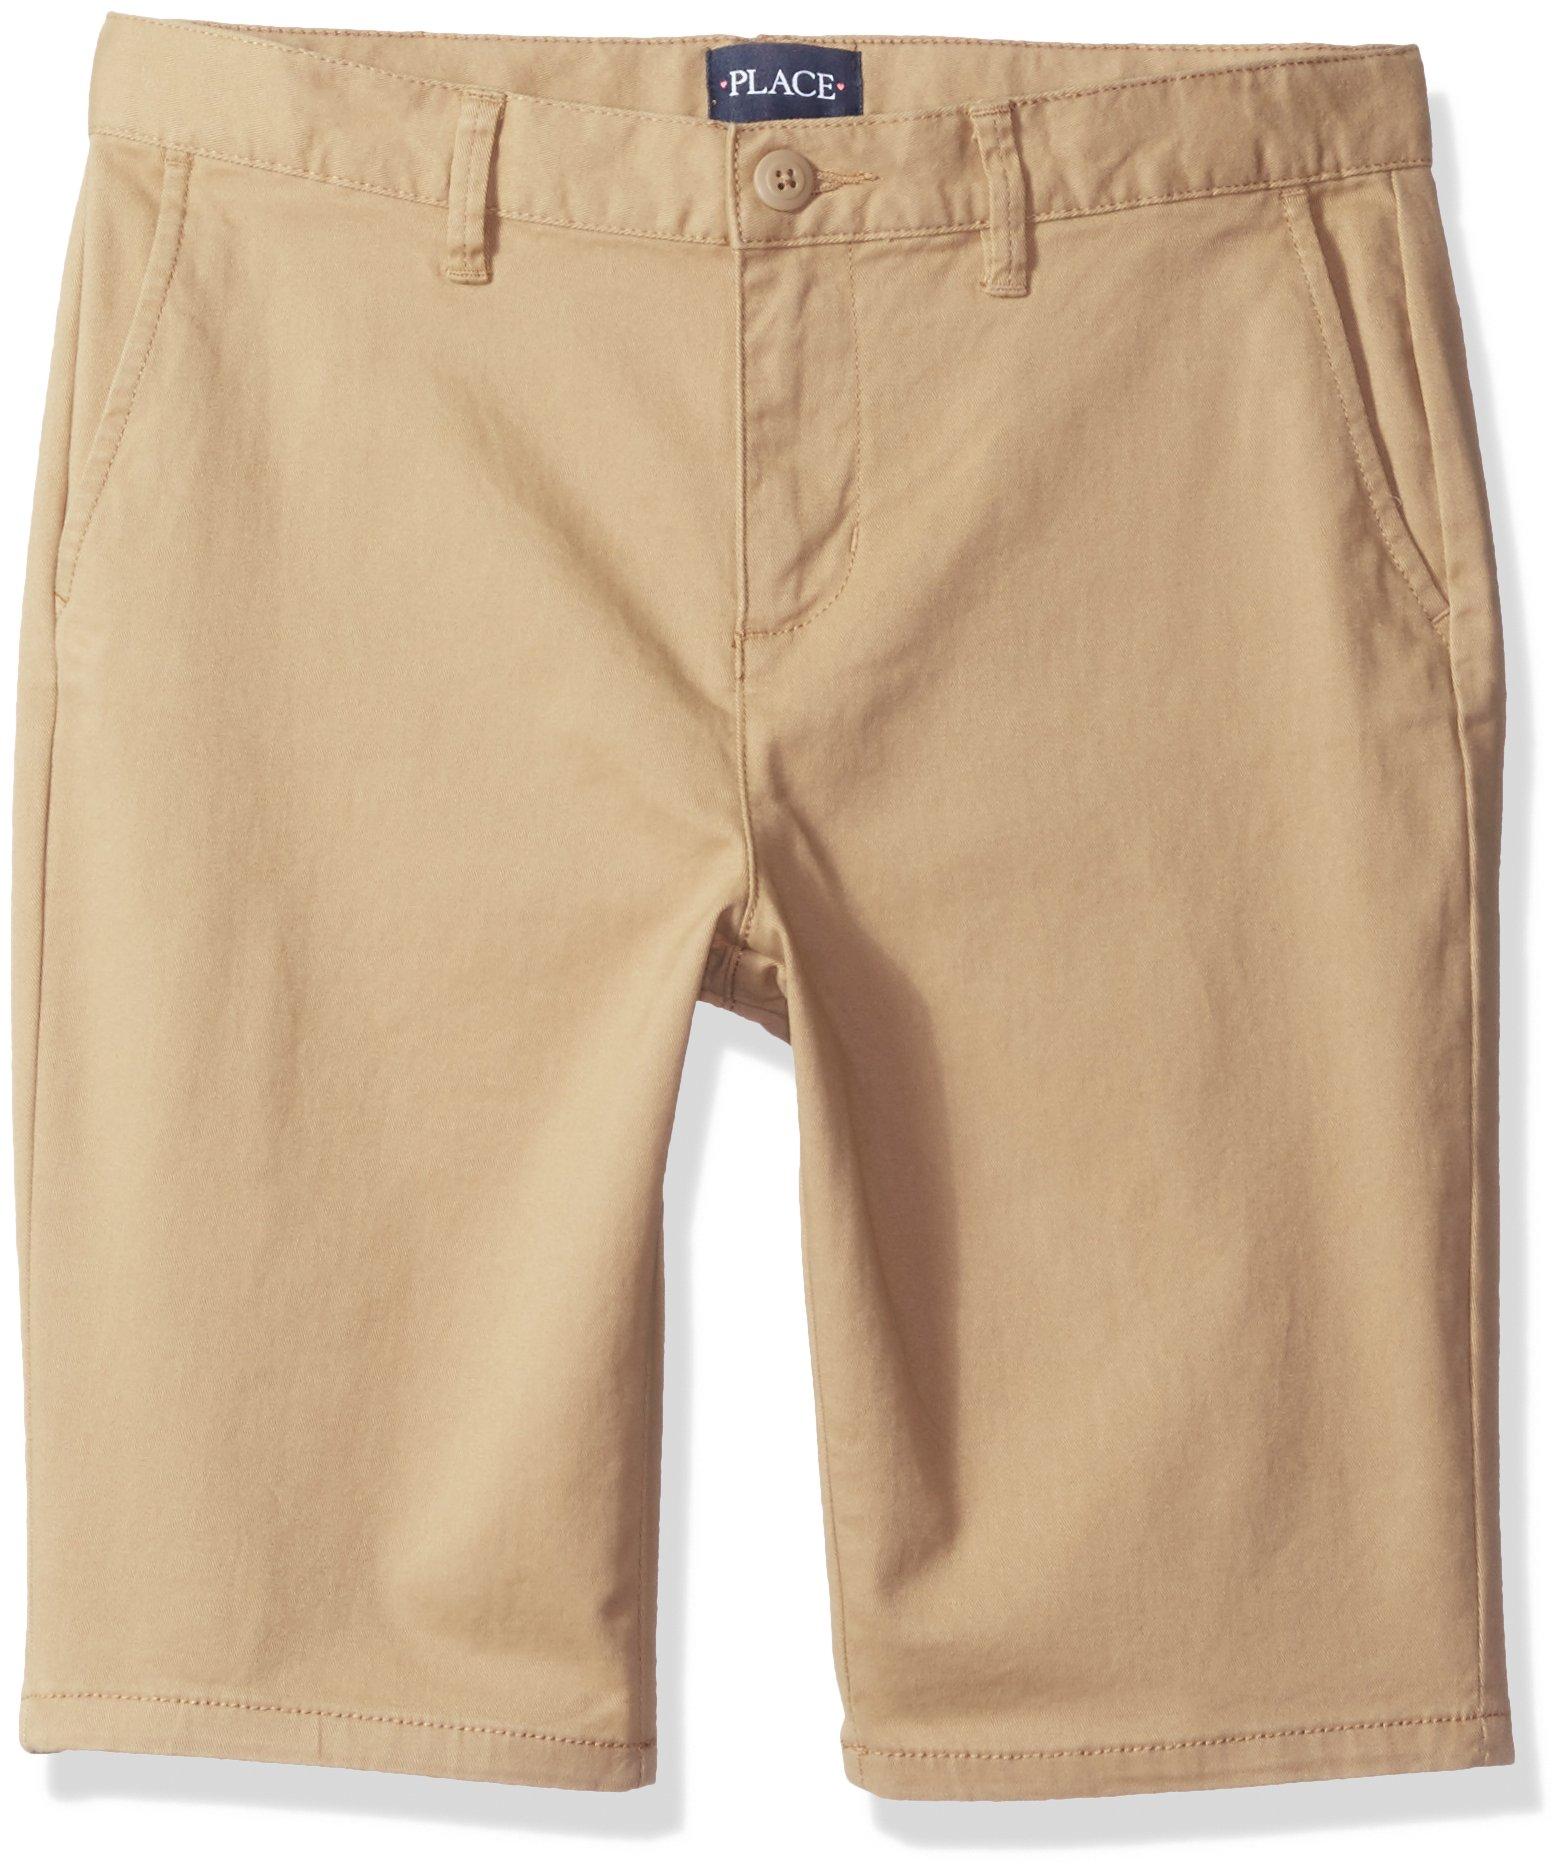 The Children's Place Girls Size Uniform Shorts, Sesame 9011, 6 Slim